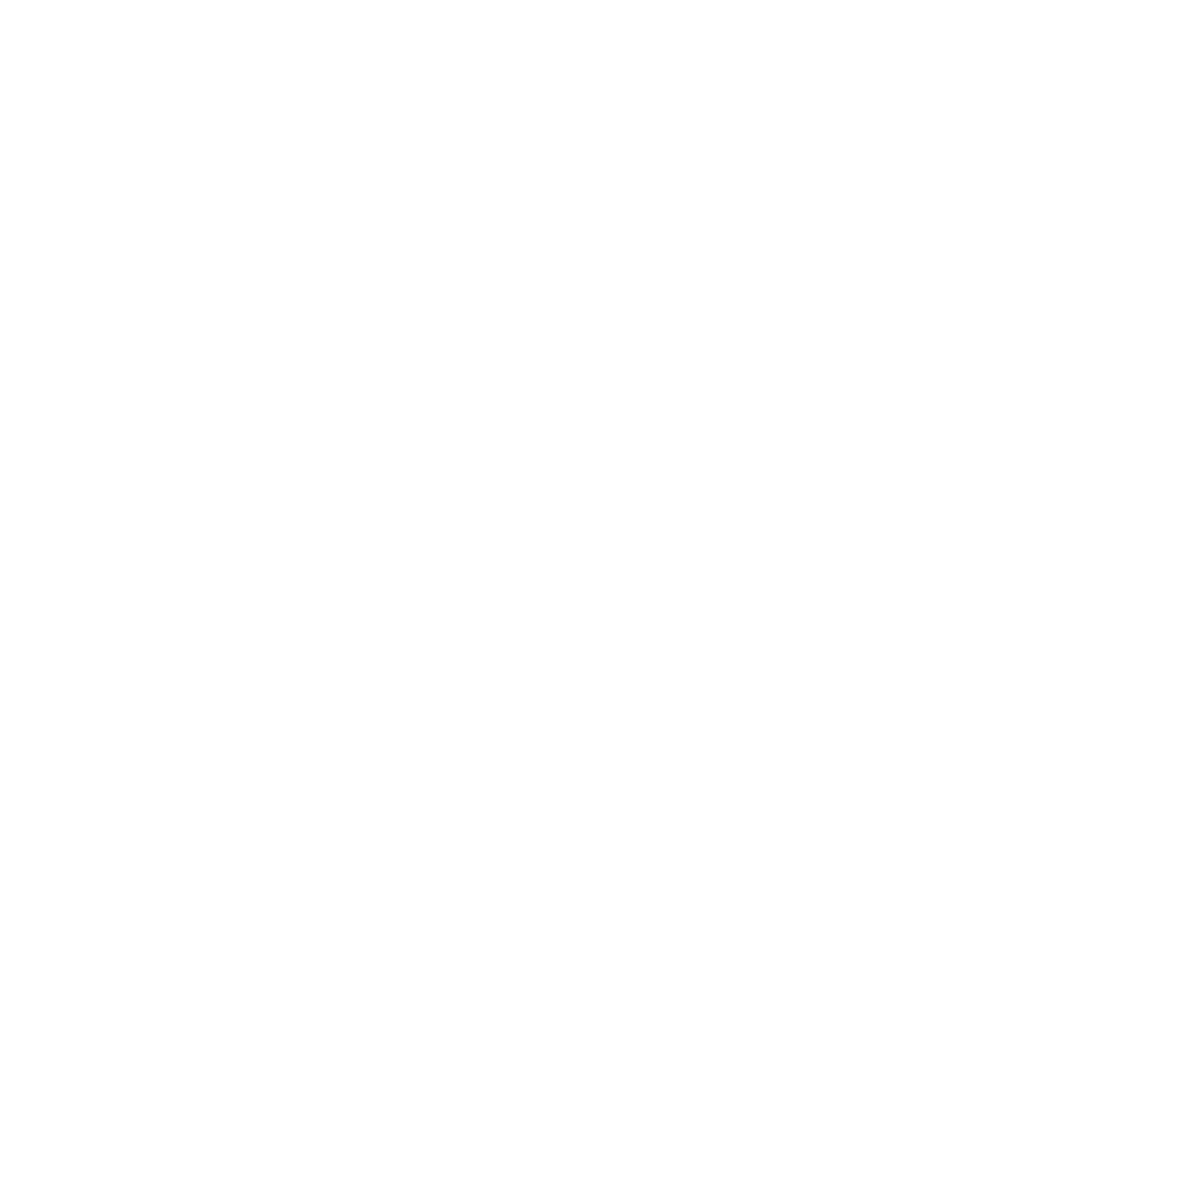 Universitat Zurich logo HoCoSo Track record